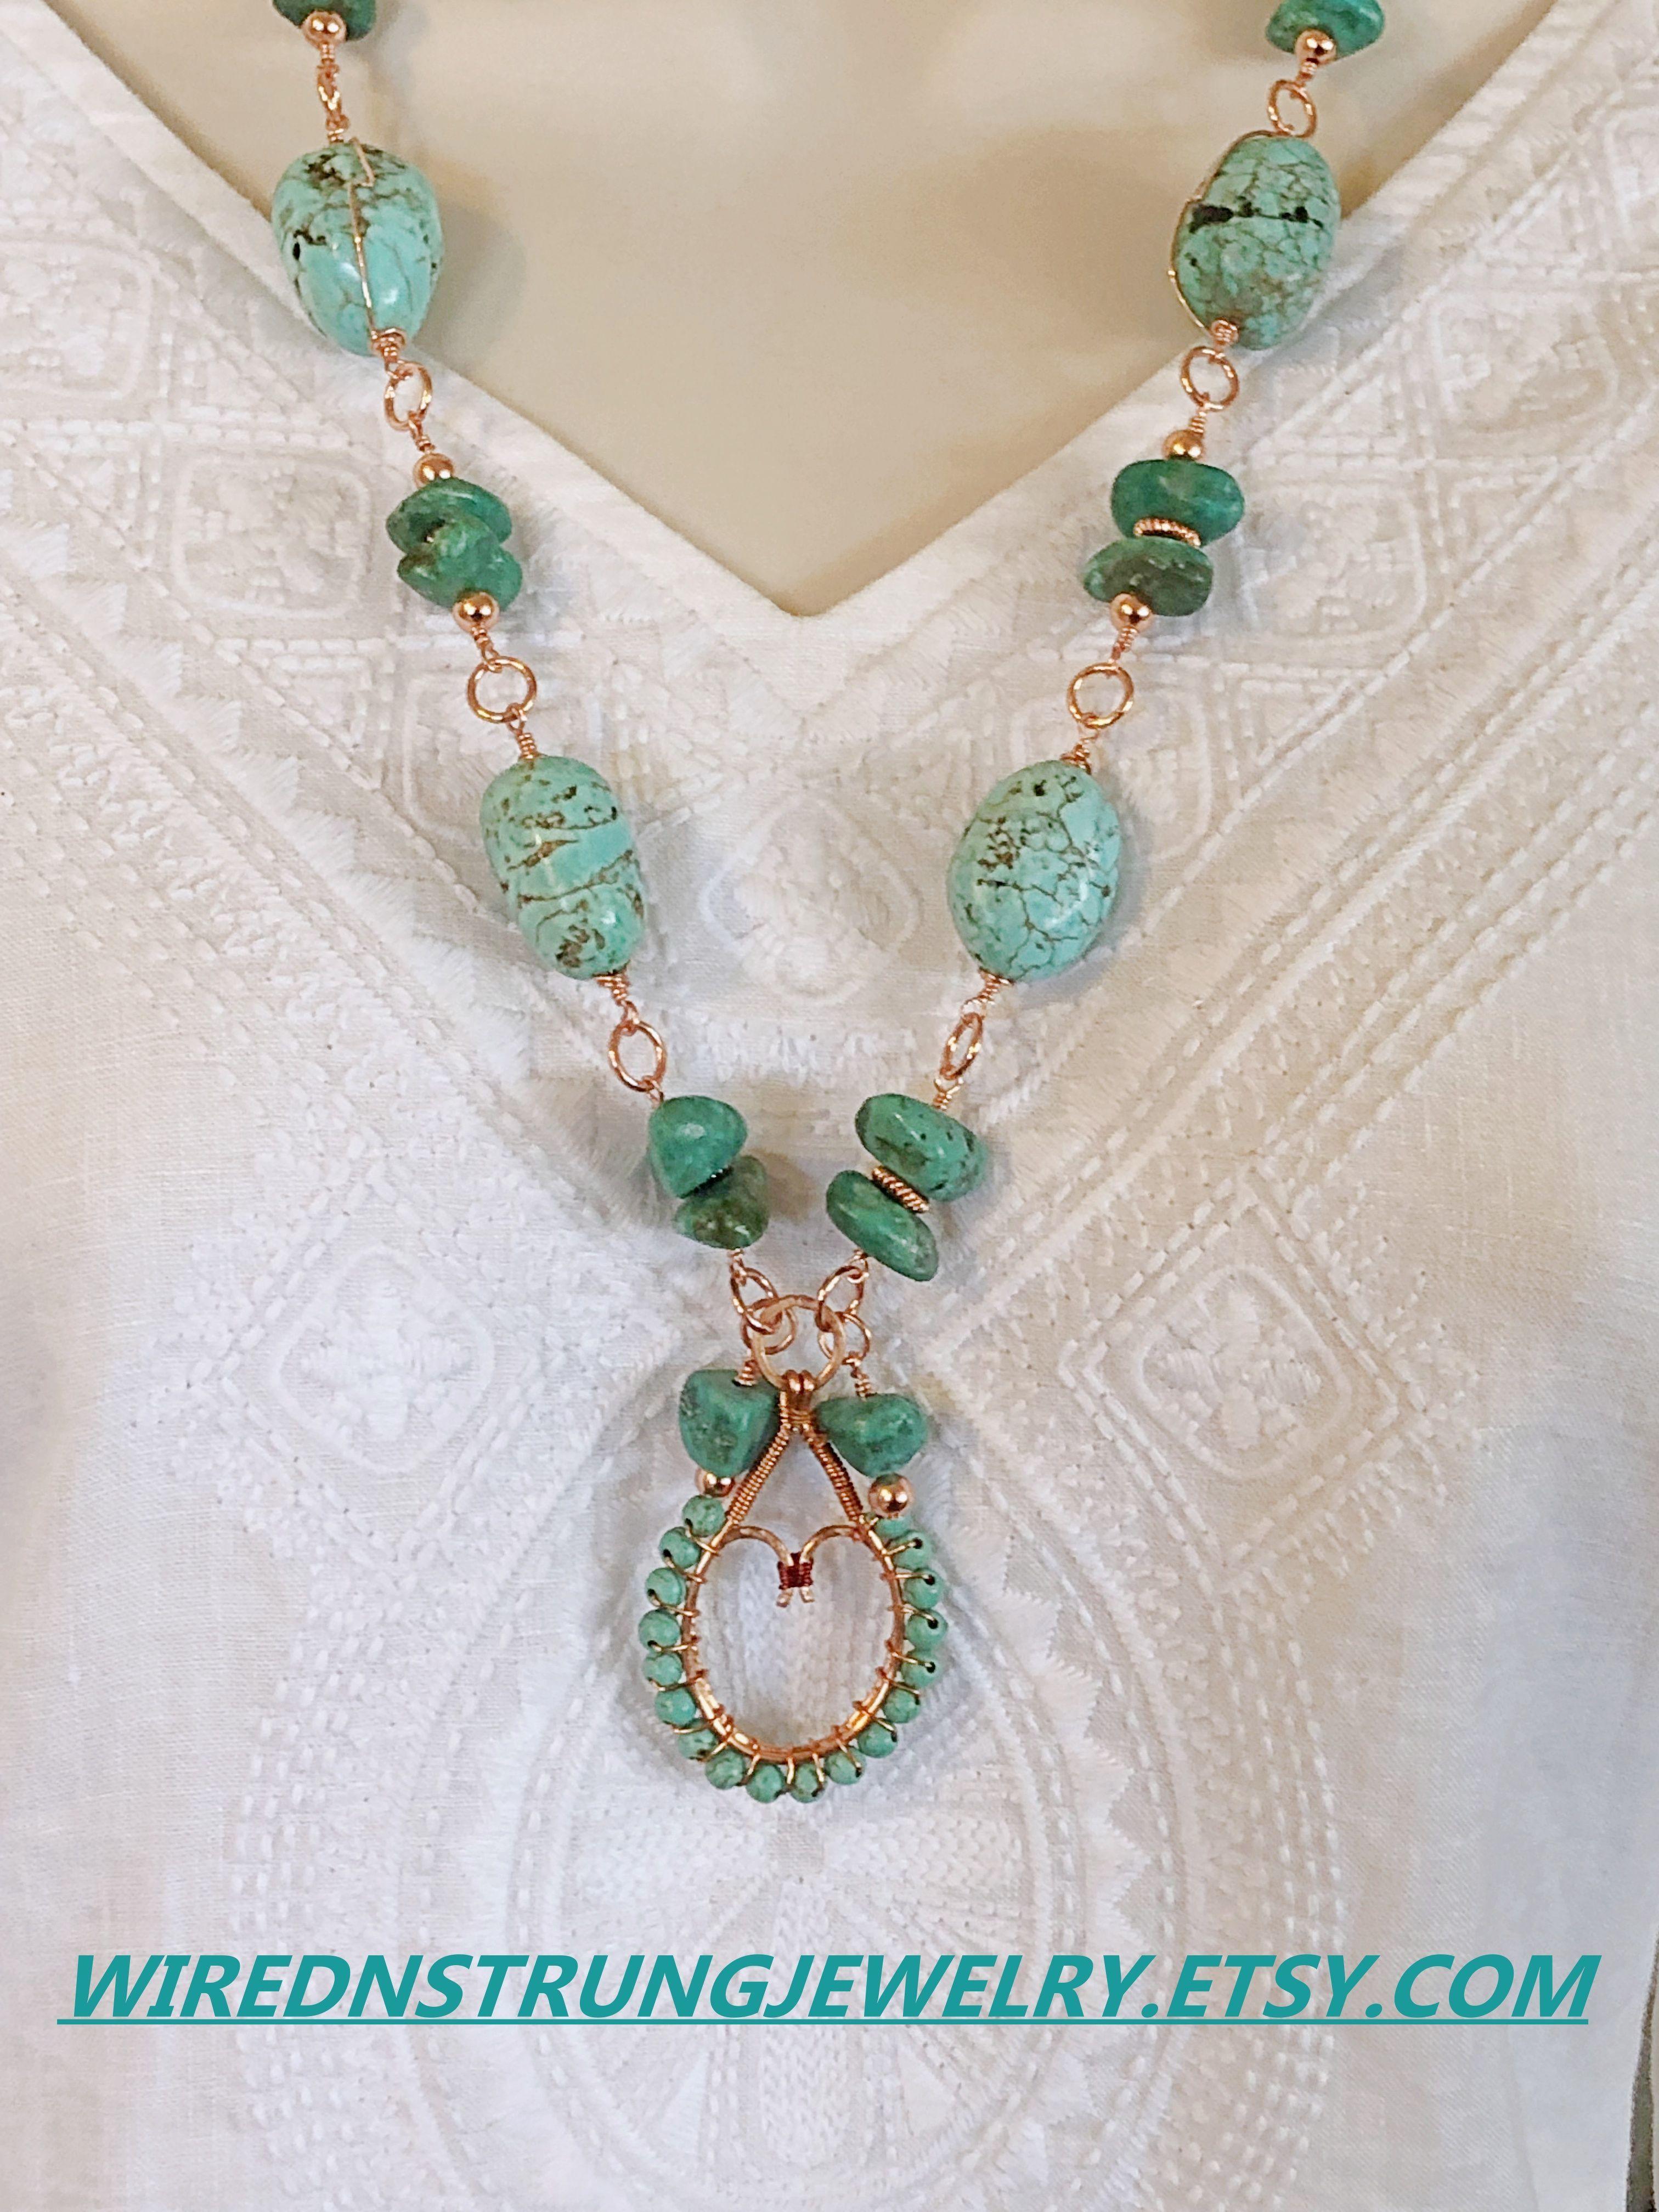 706fbddf432a4 Statement Necklace, Turquoise Necklace, Magnesite Necklace set ...